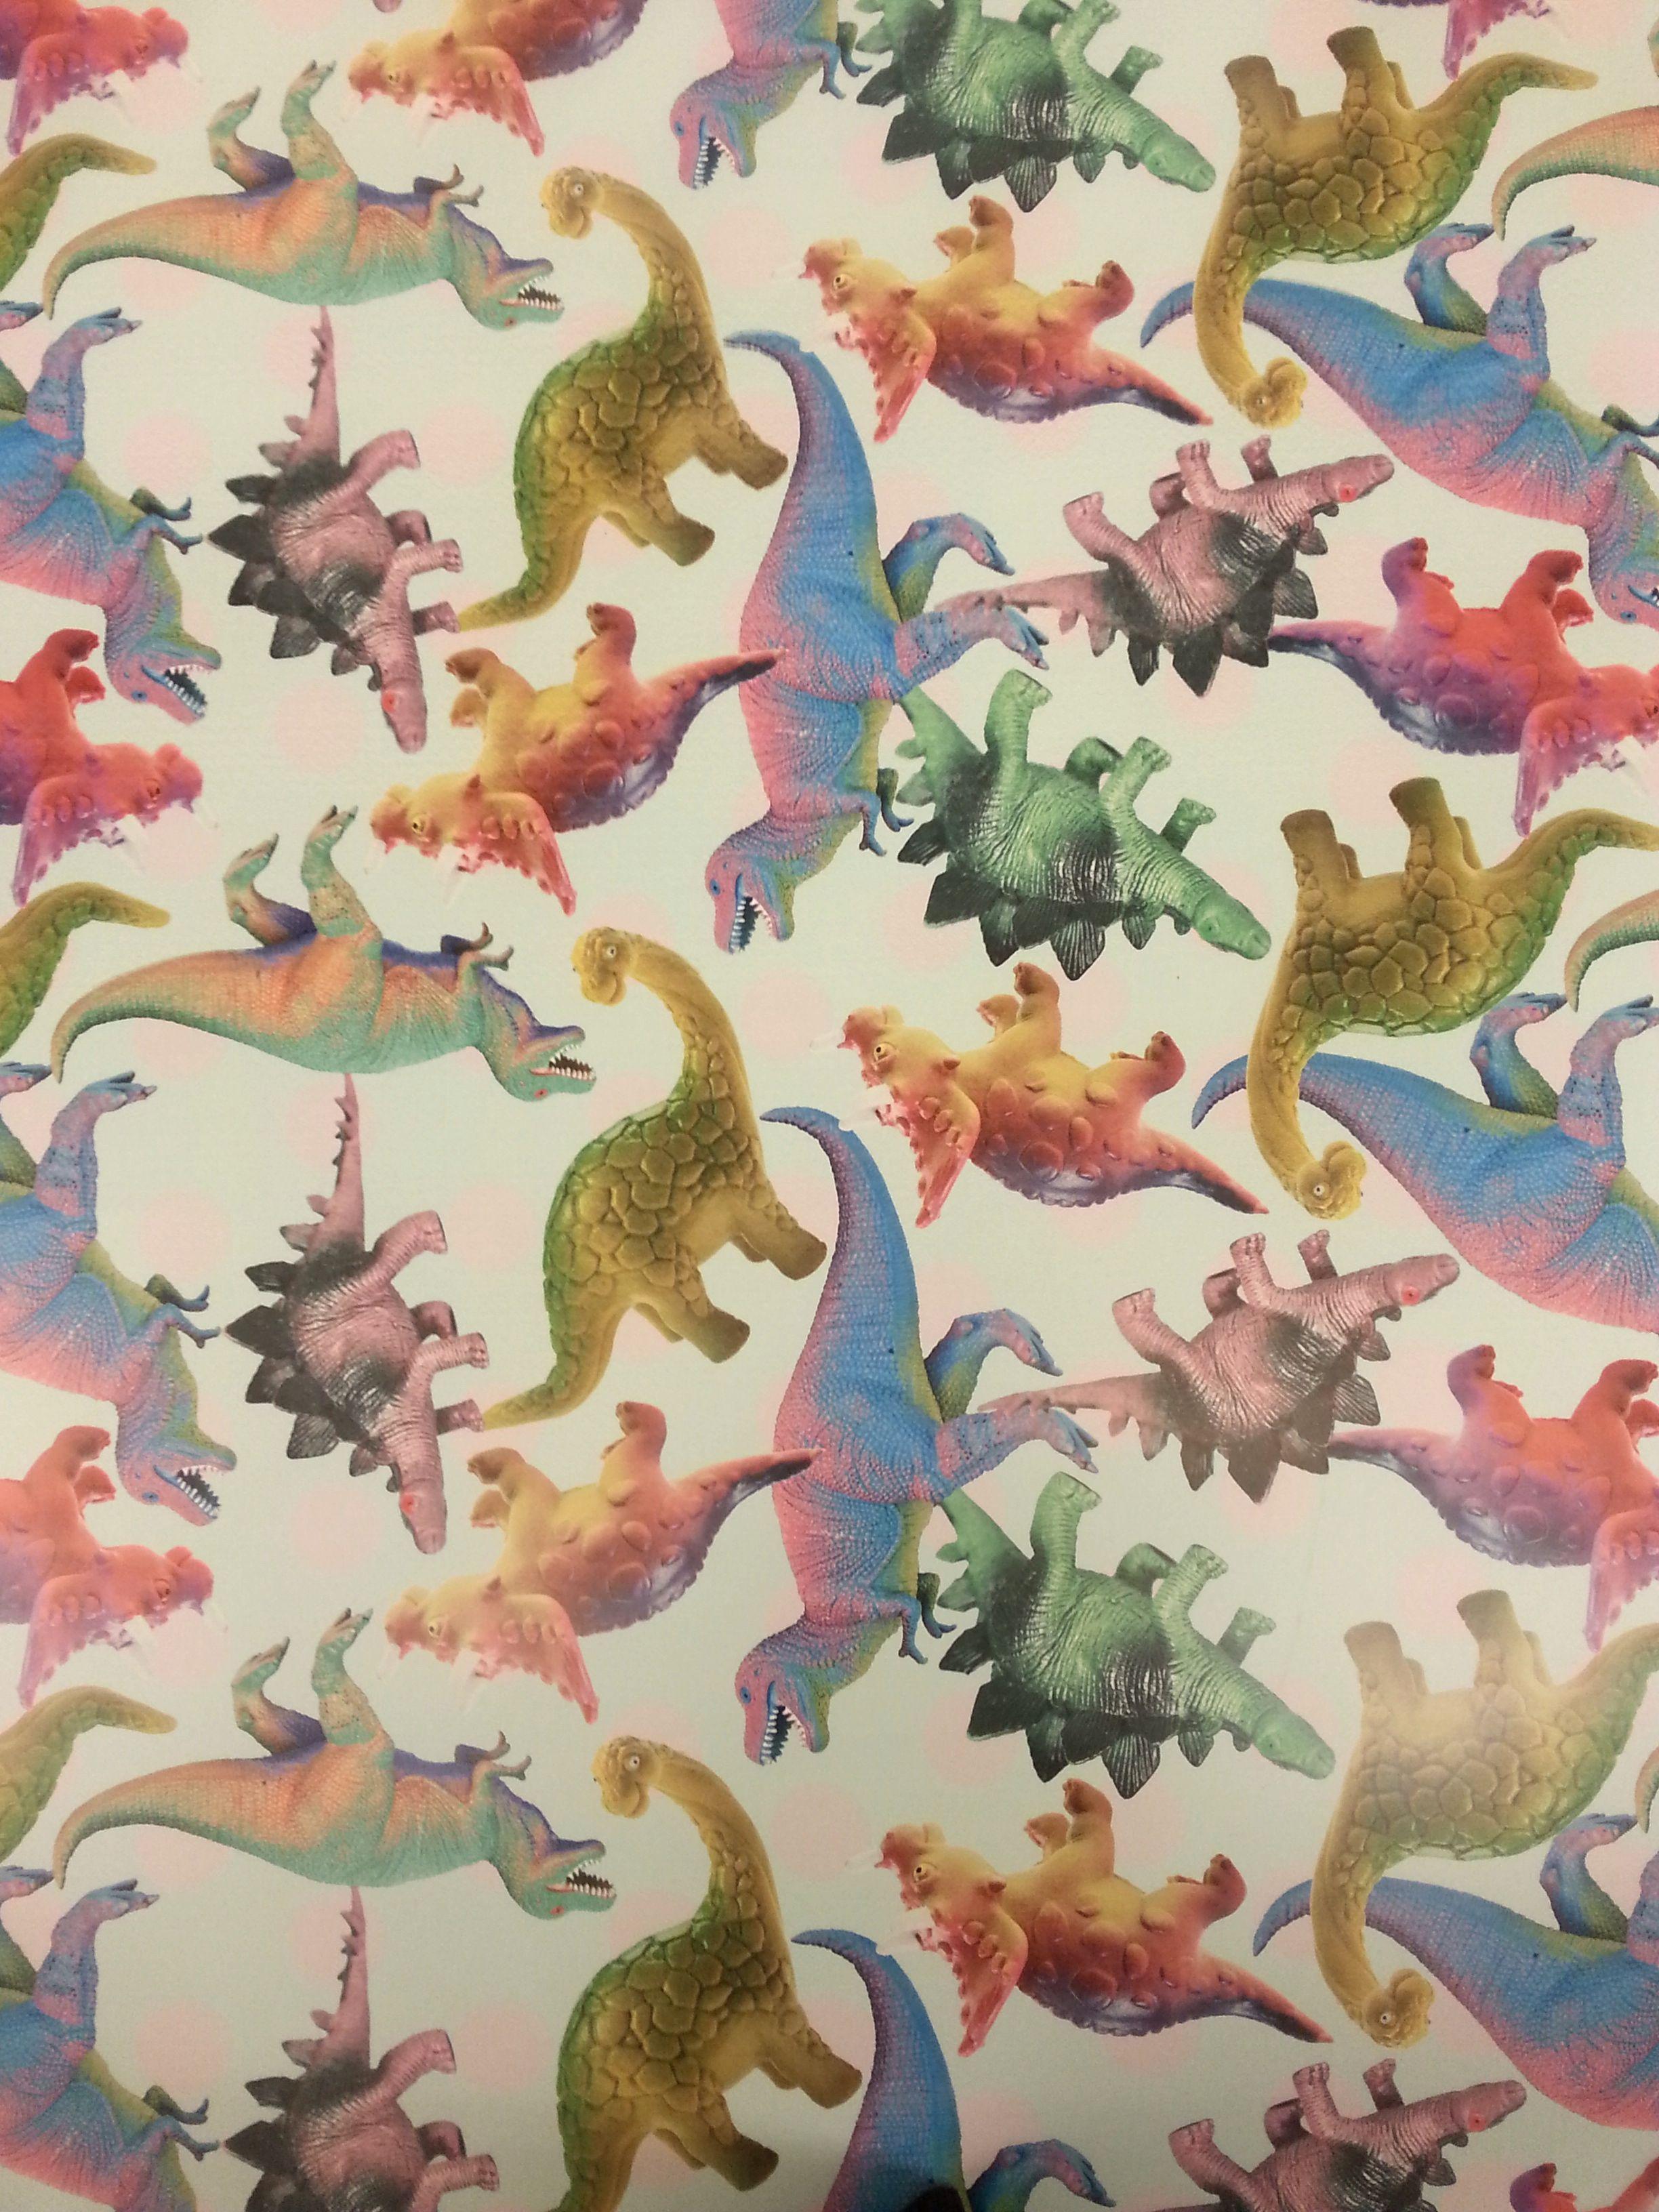 Dinosaur Wallpaper Fondos De Dinosaurios Dibujos Tarjetas De Acuarela